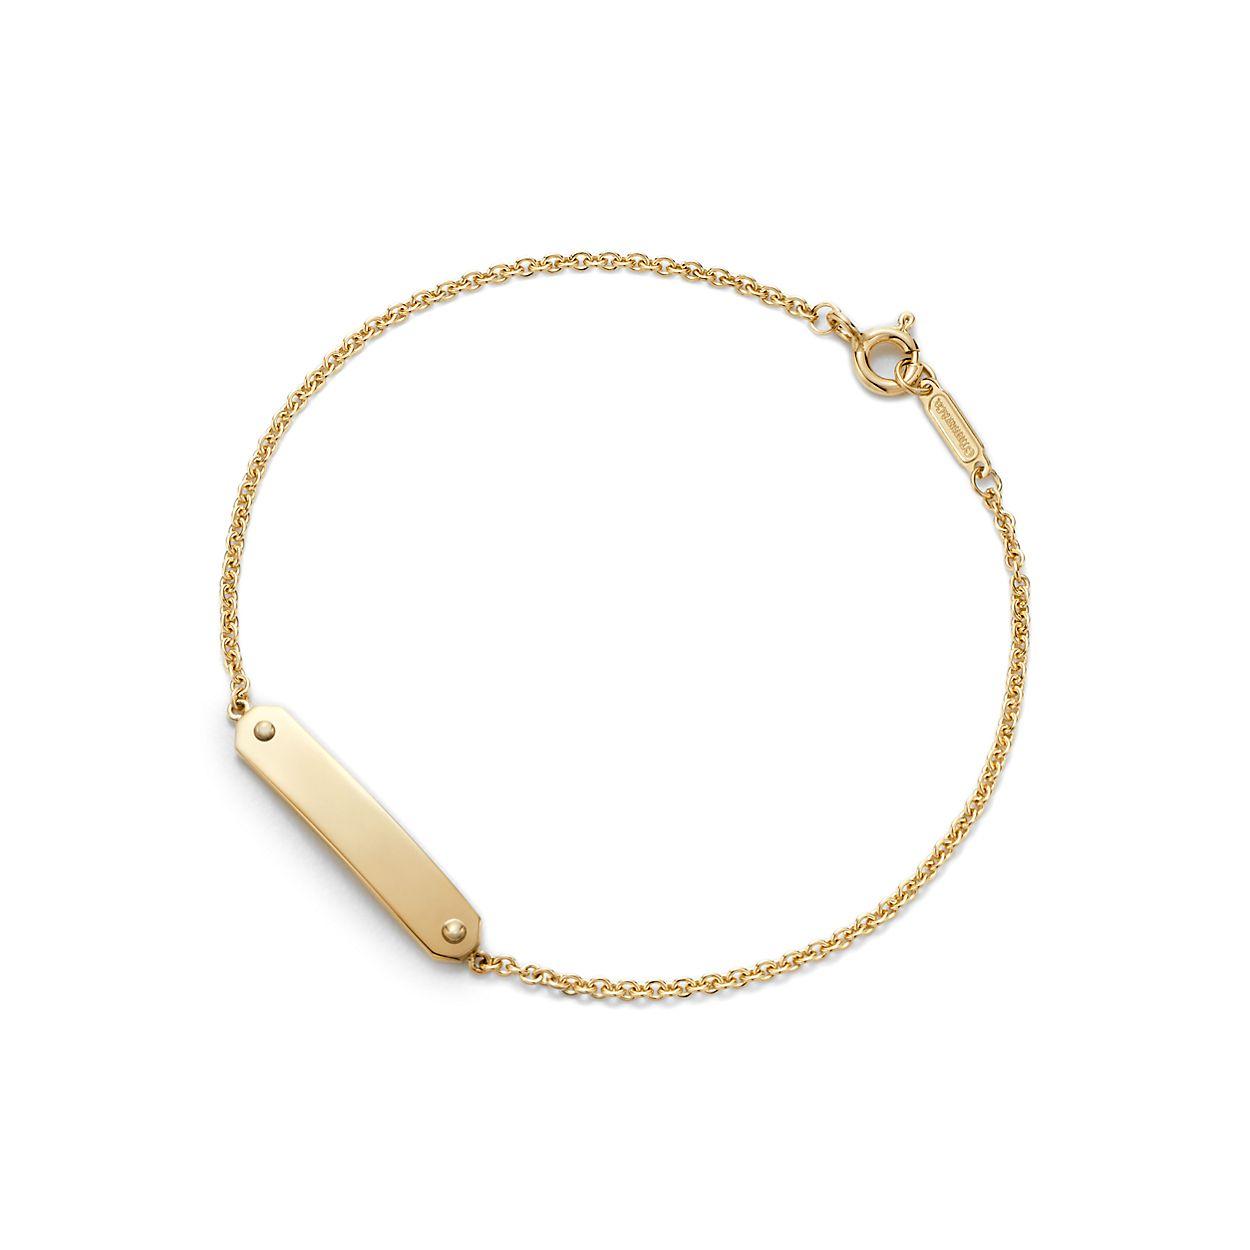 Tag Chain Bracelet